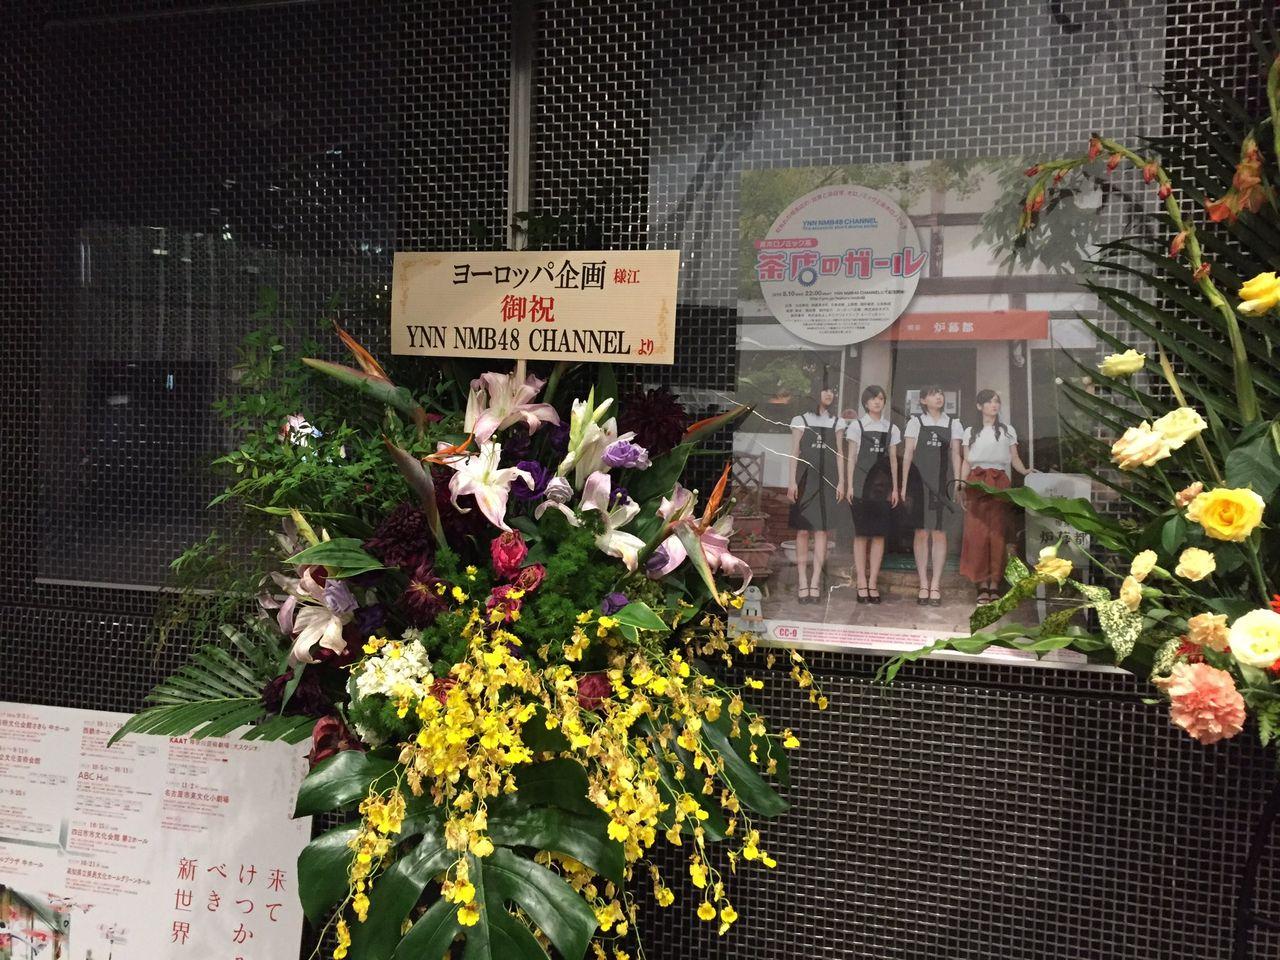 【NMB48 6周年ライブ】アンガールズ田中、花束を山本彩、矢倉楓子に贈る模様